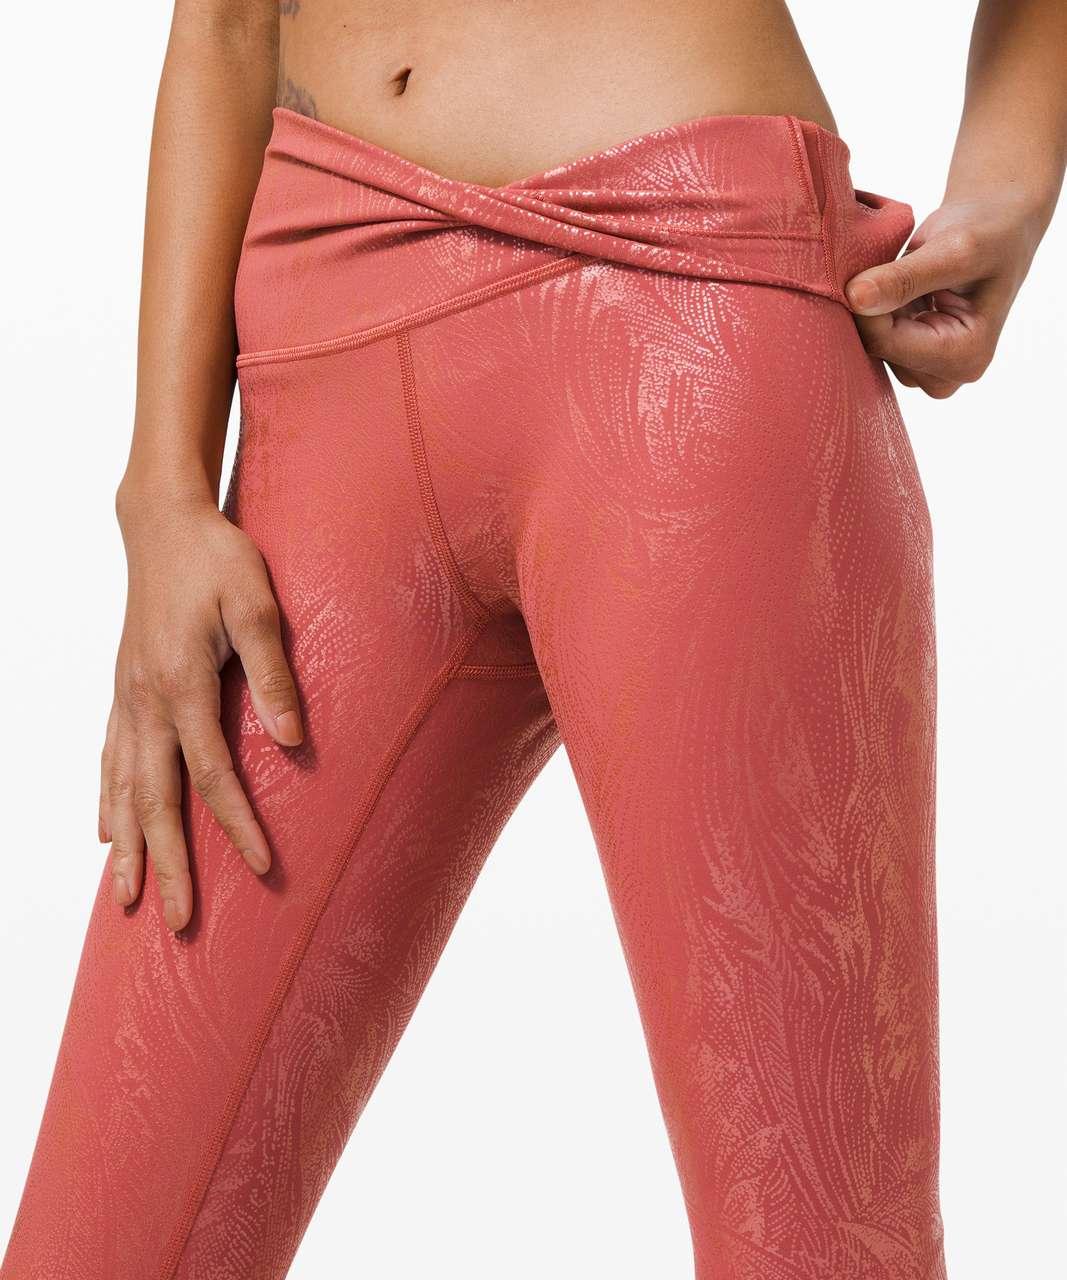 "Lululemon Wunder Under High-Rise Crop 23"" *Shine - Acclimatize Soft Cranberry Pink Foil"